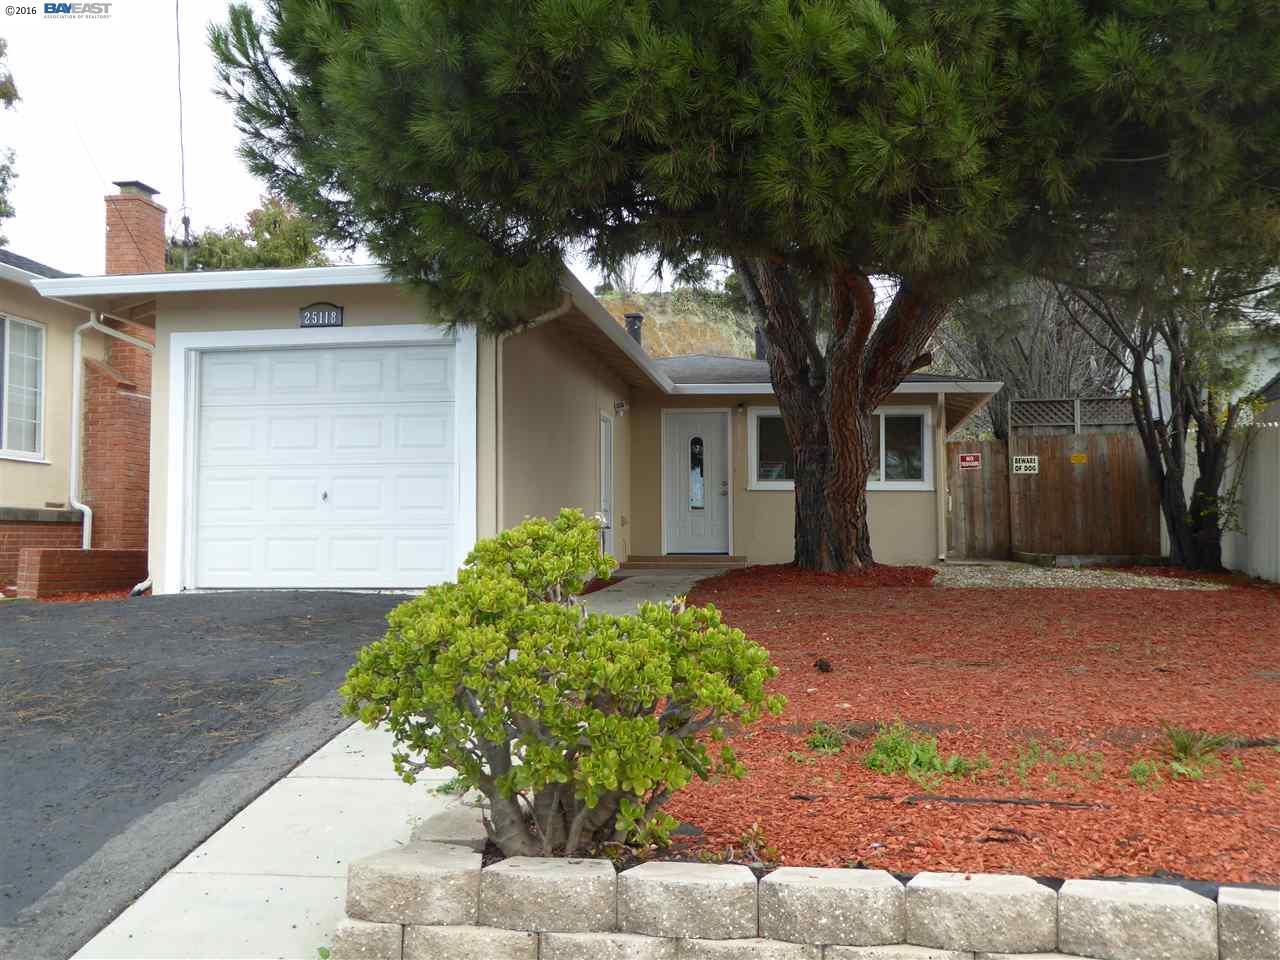 25118 Belmont Ave, Hayward, CA